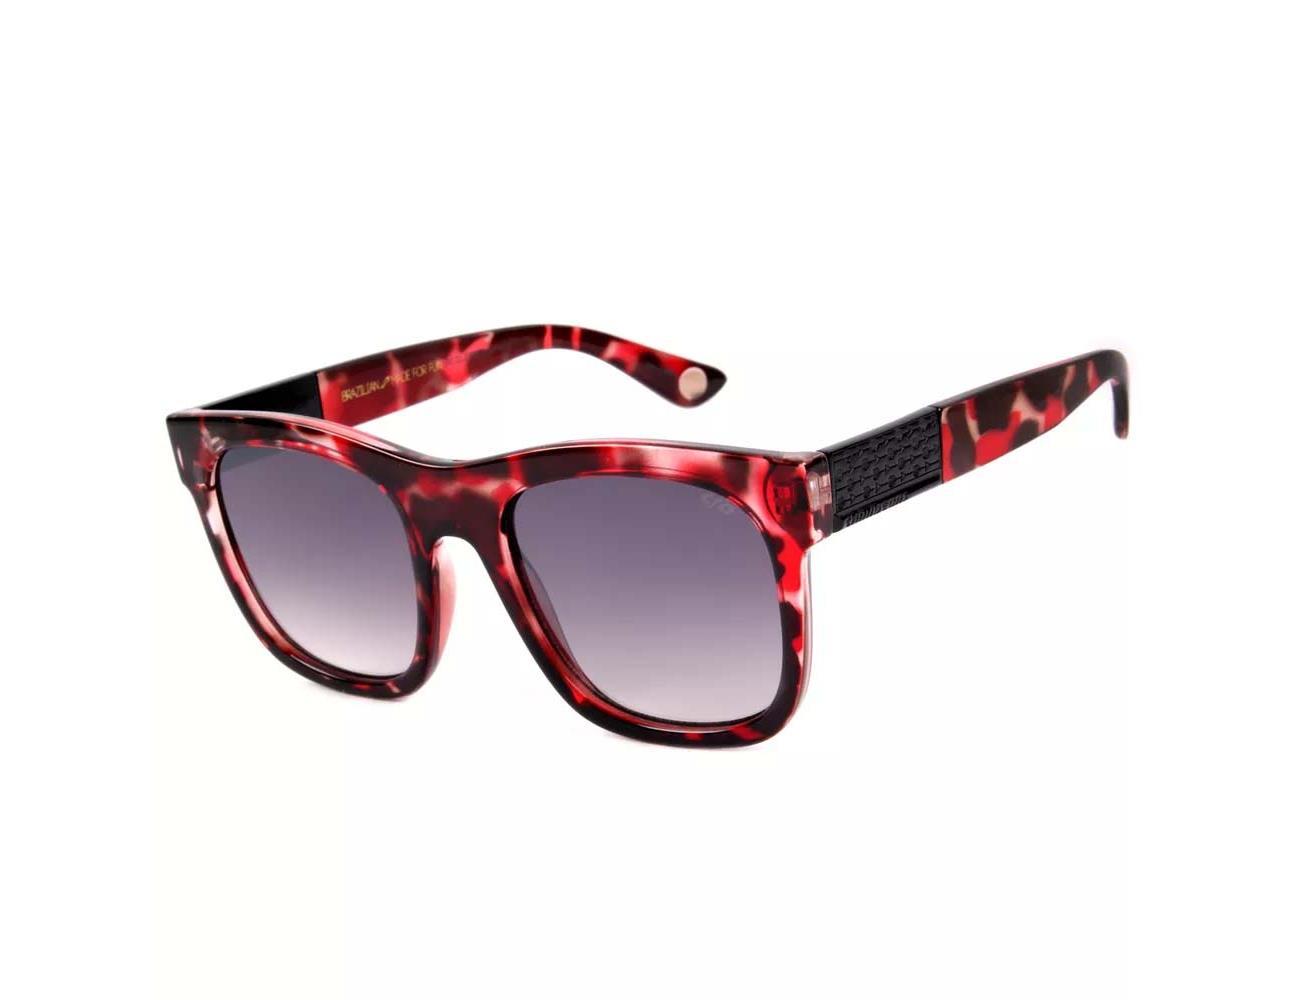 47ac4d9b0a3 Oversized square chilli beans sunglasses kefera collection flash wine jpg  1308x1000 Chilli beans